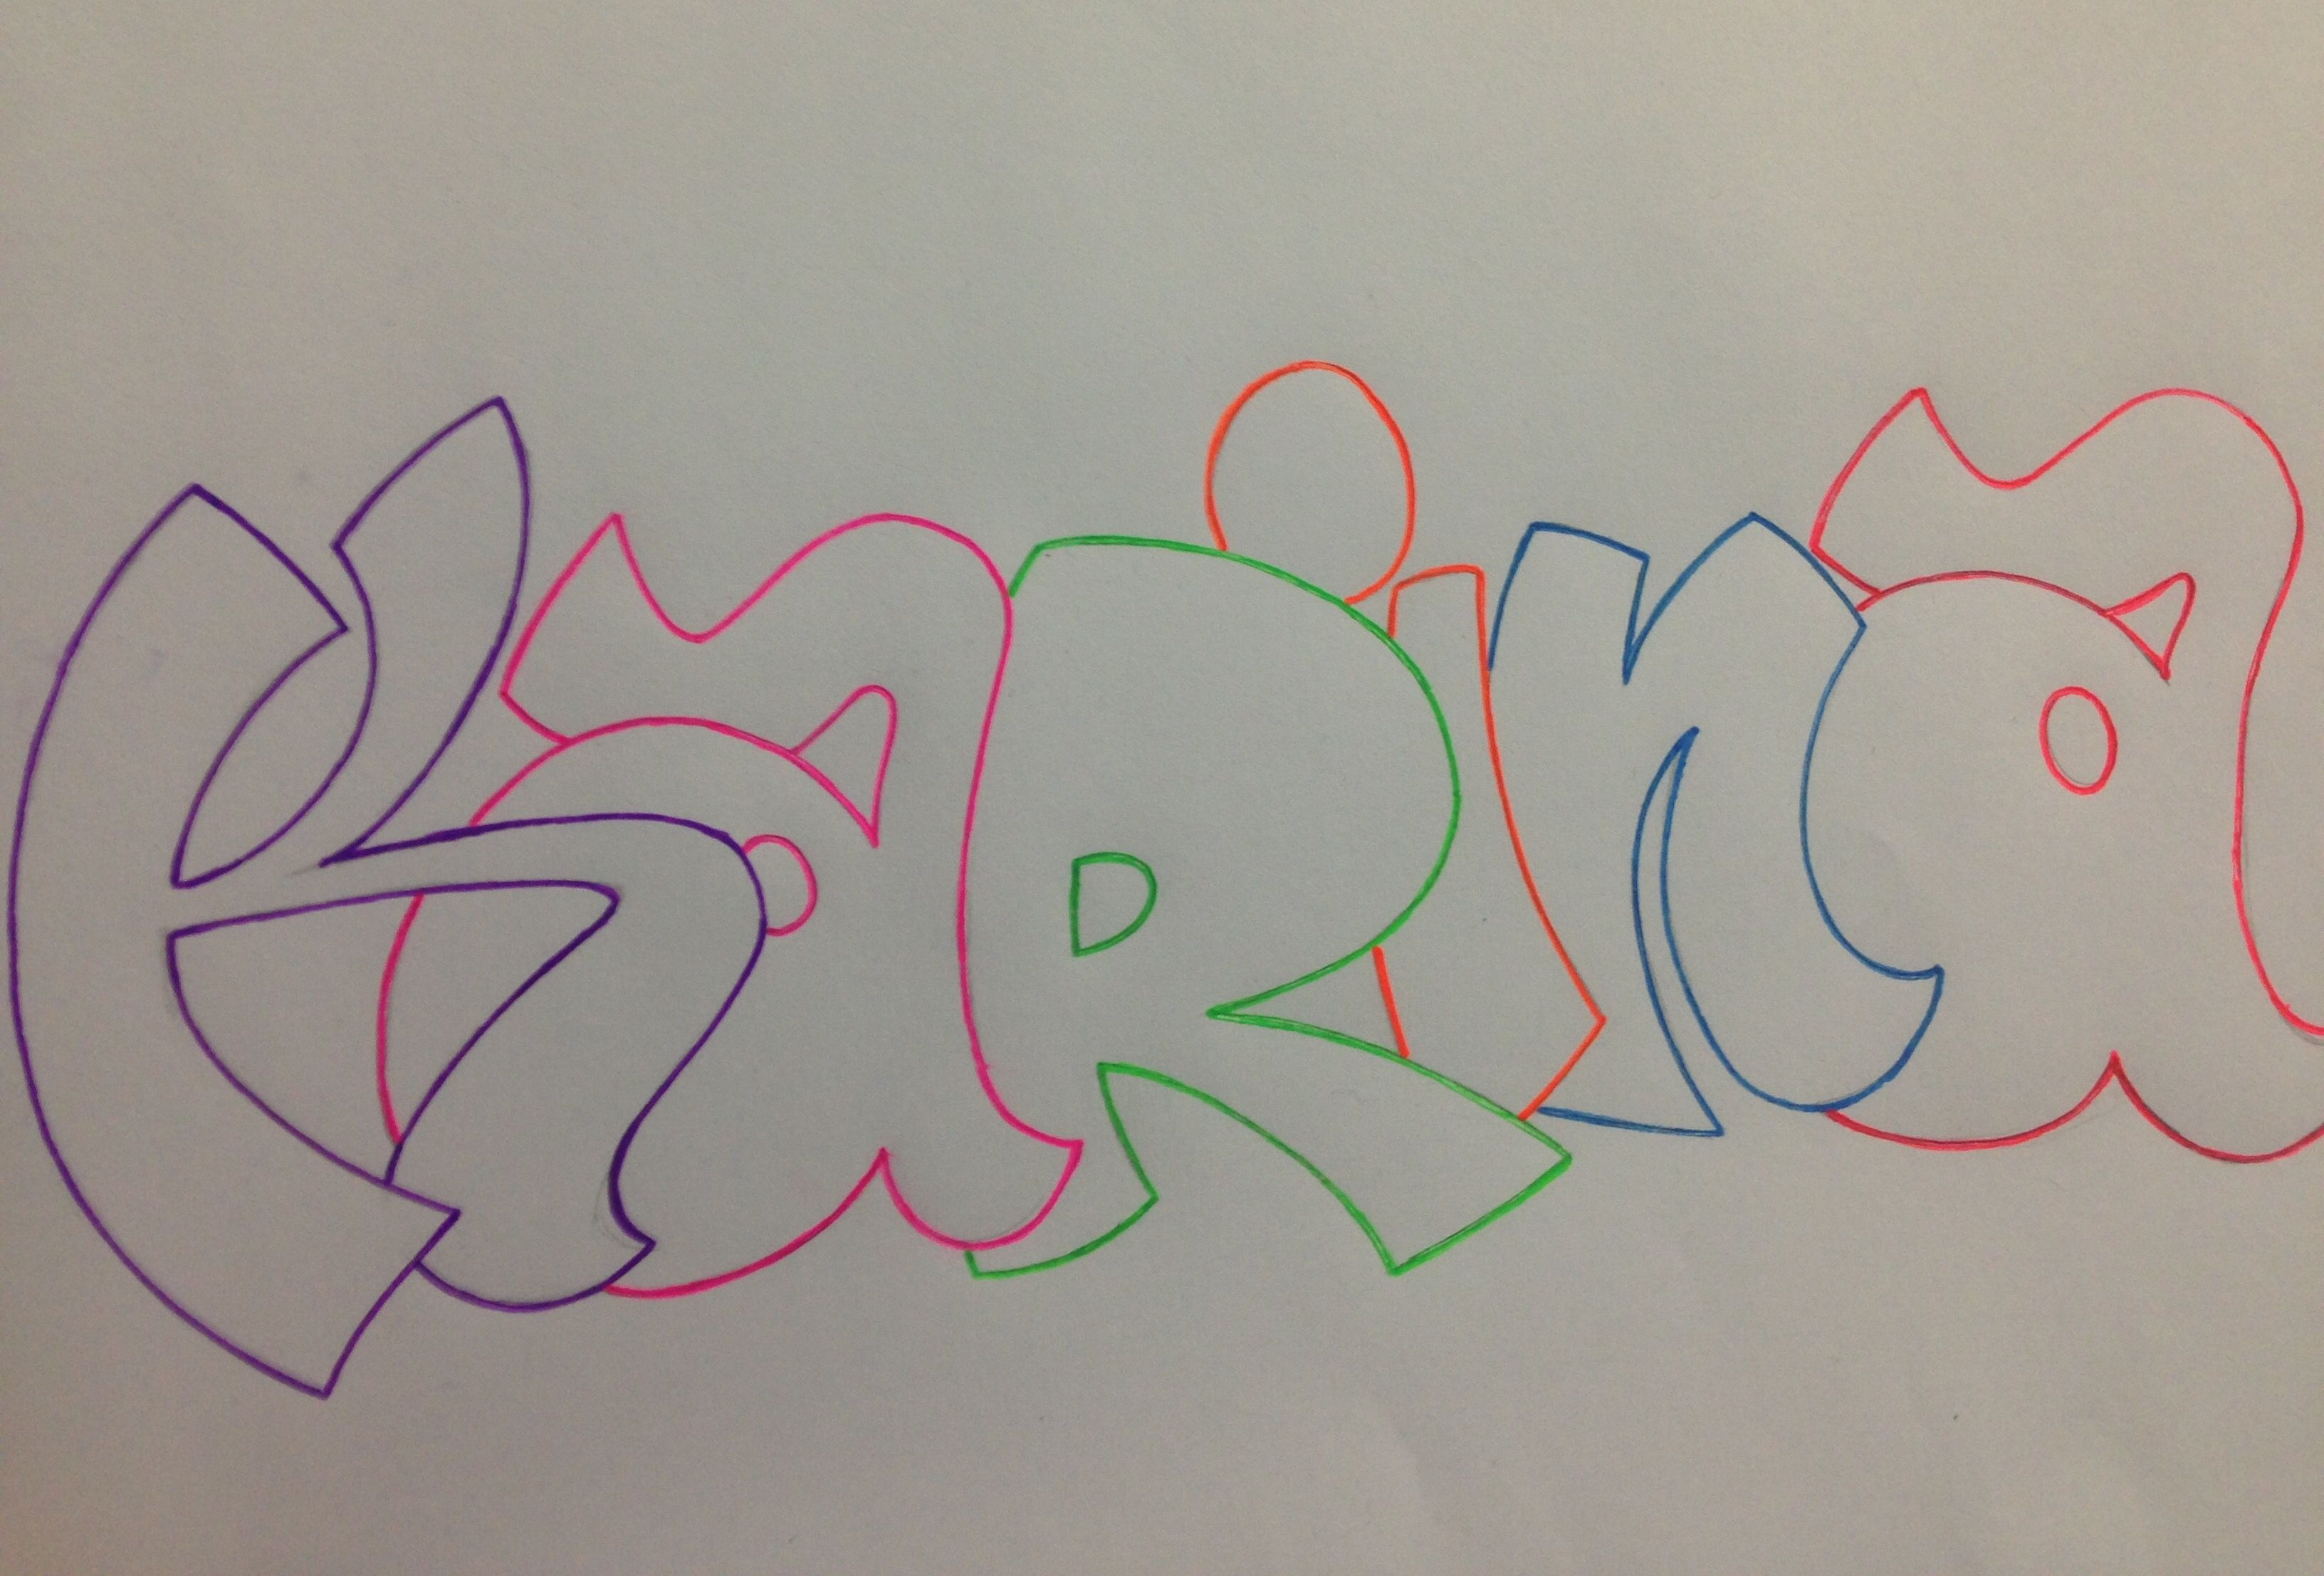 Karina #Graffiti #Art | My Personal Graffiti | Pinterest | Graffiti ...